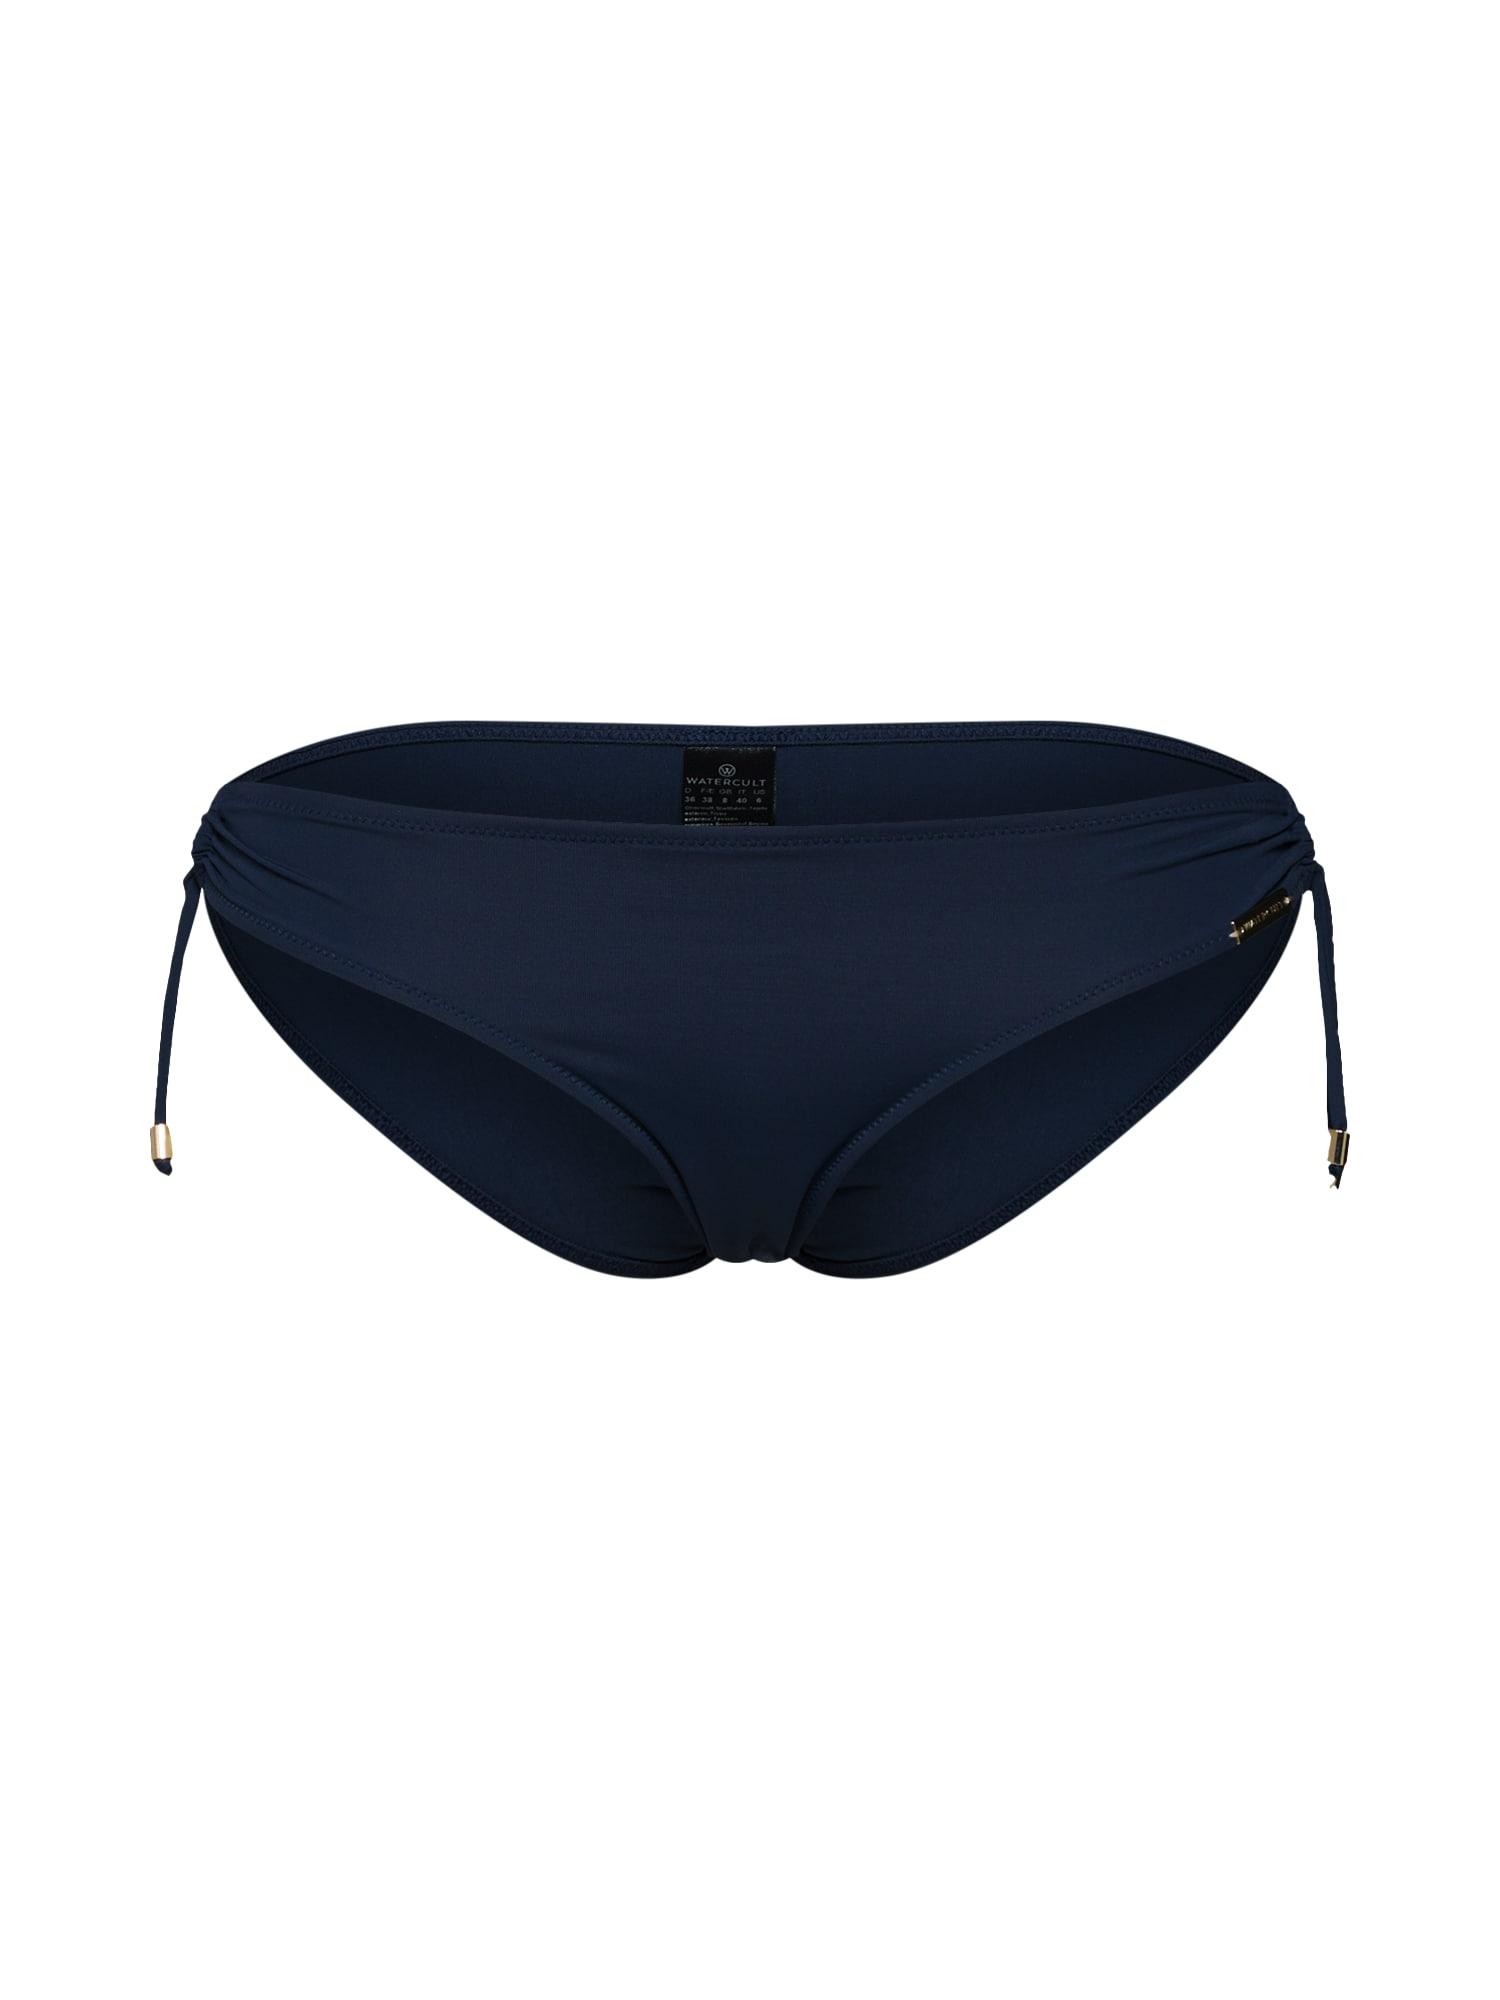 Spodní díl plavek tmavě modrá Watercult